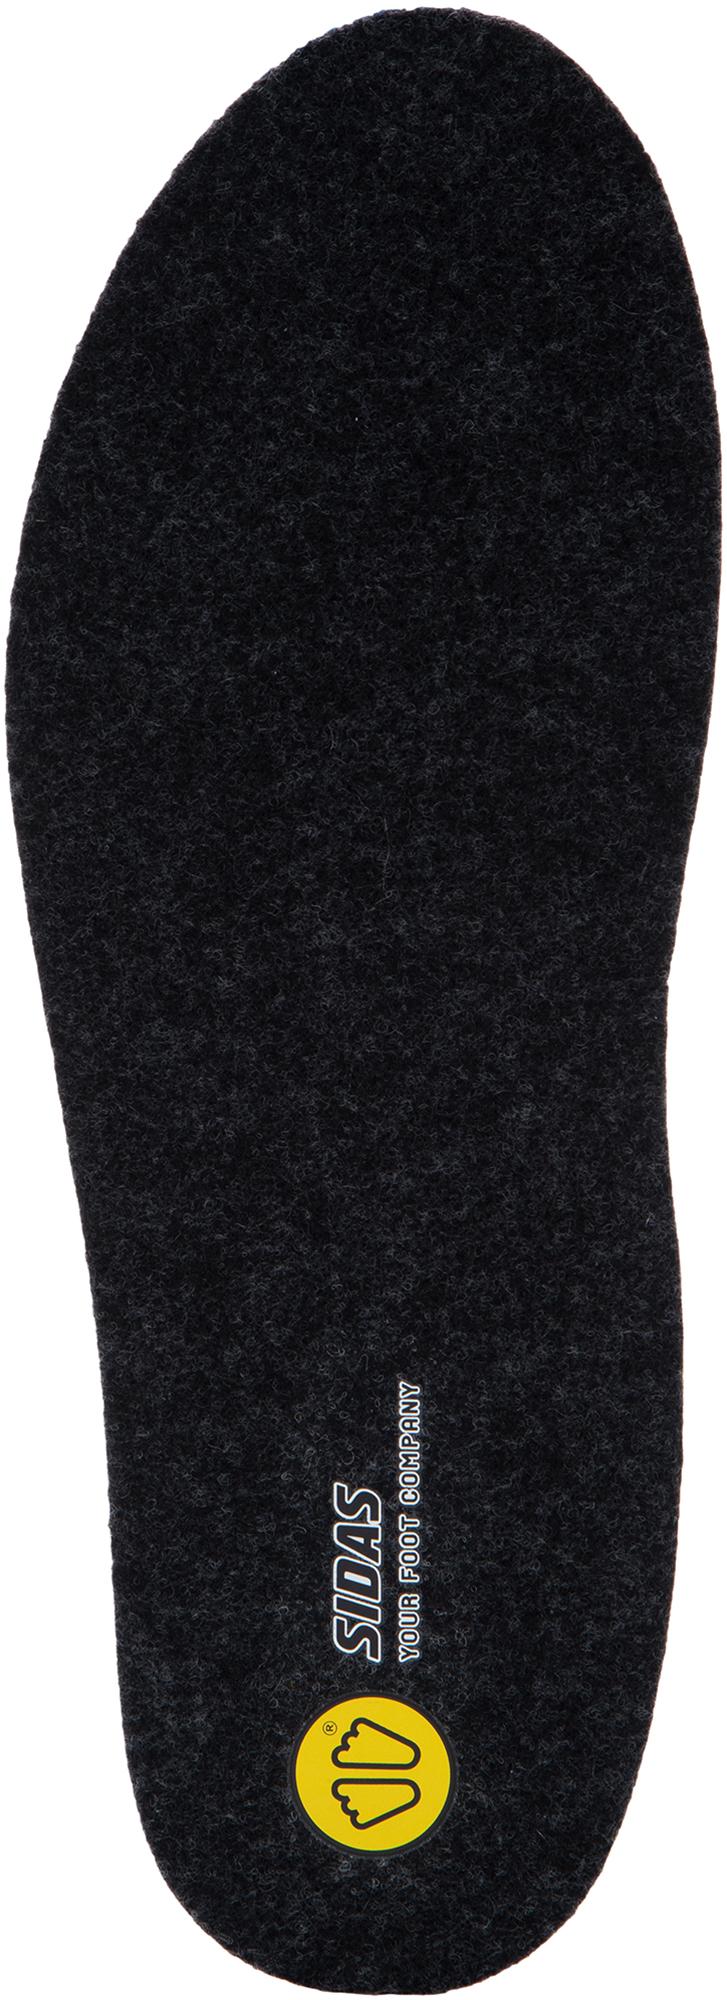 Sidas Стельки Custom Comfort Merino, размер 39-41